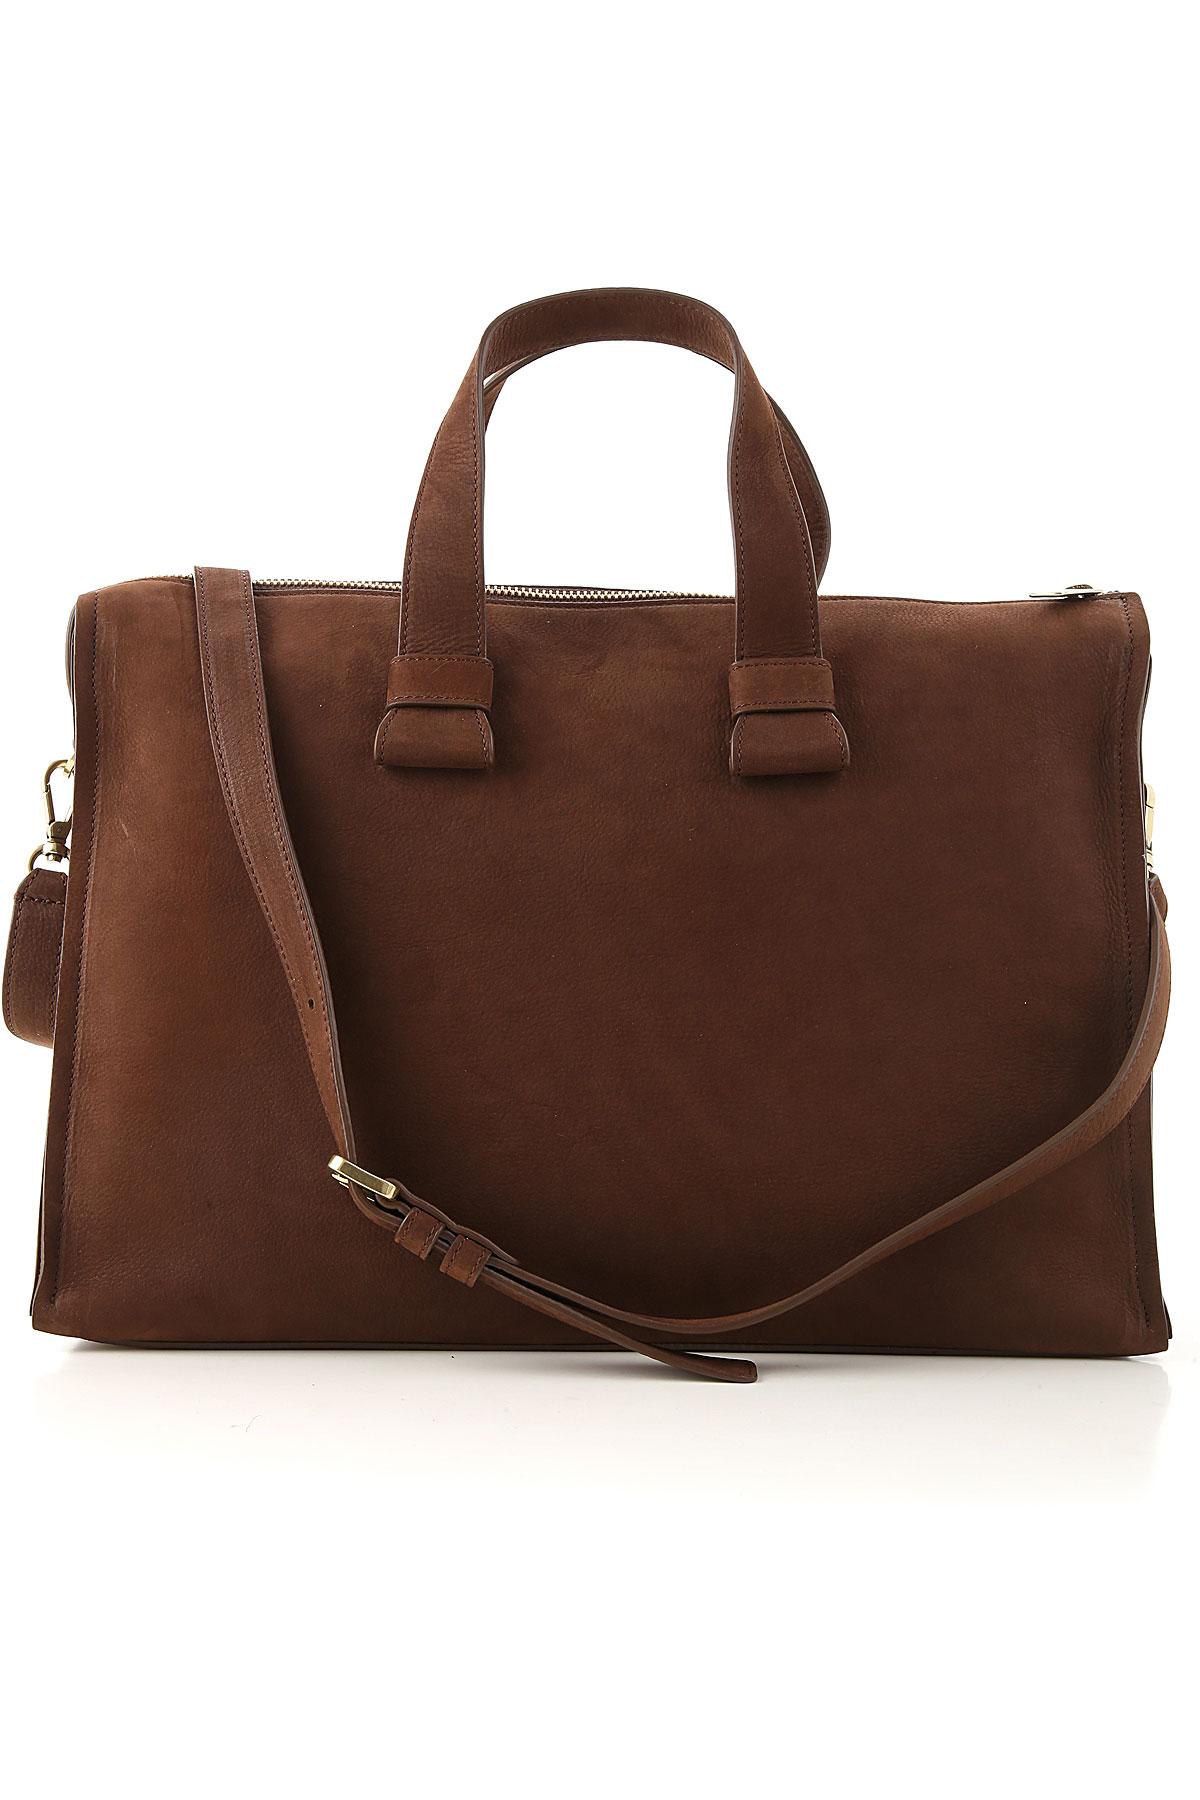 Orciani Top Handle Handbag On Sale, Cigar, Suede leather, 2019